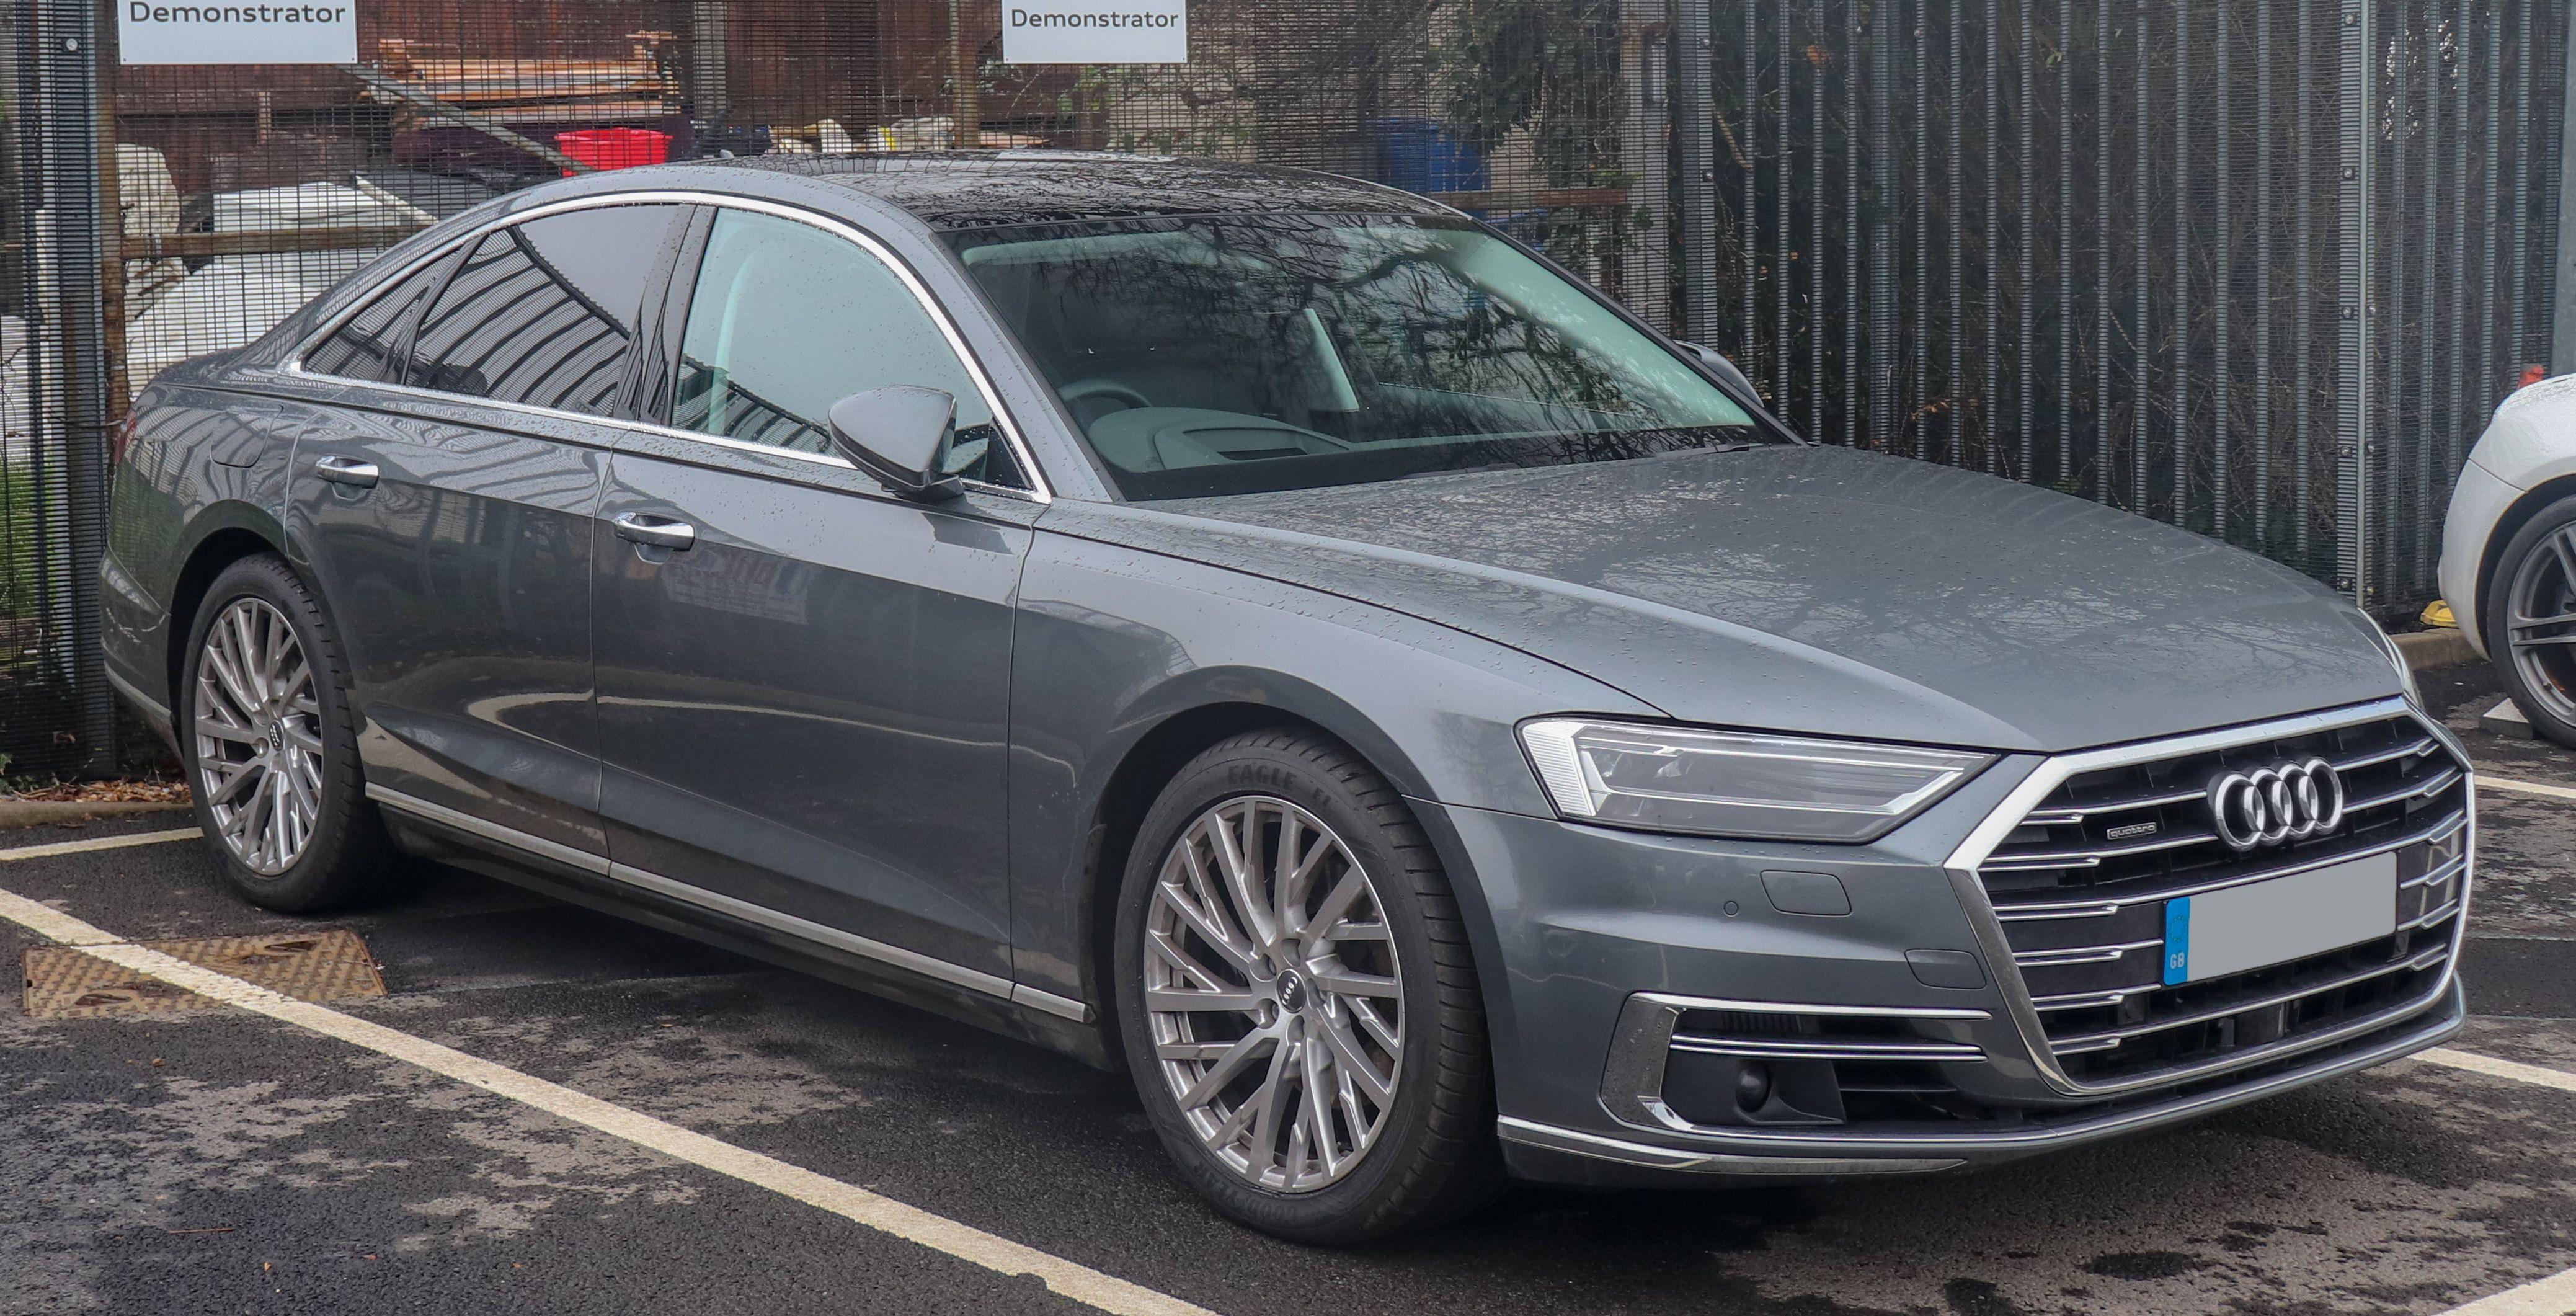 Audi A8 Audi A8 Audi Audi A6